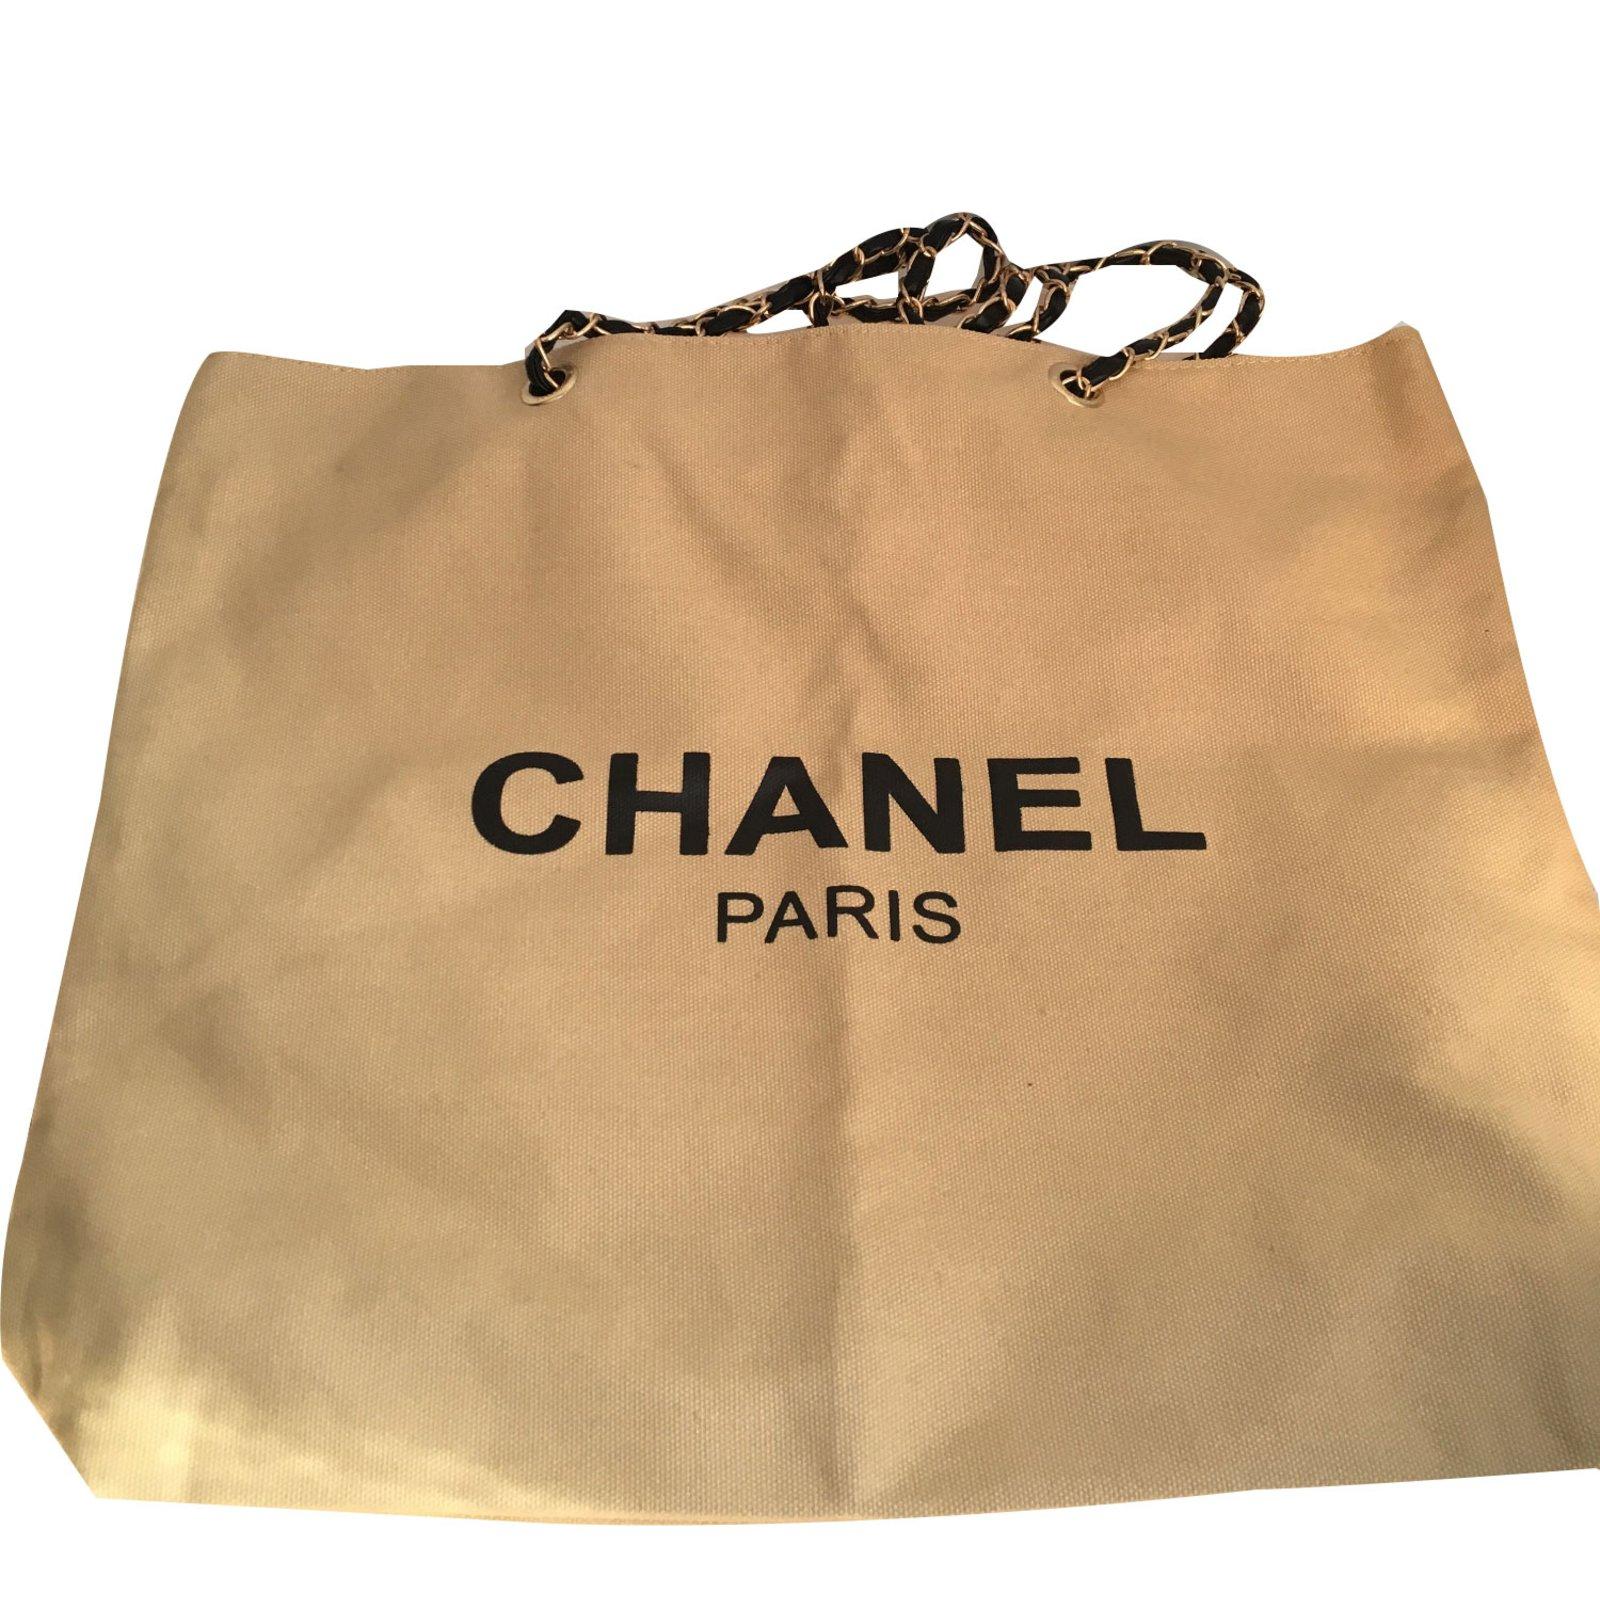 a63437e34ccdb6 Chanel Chanel beige bag vip gift 2018 Gold chain Totes Cloth Beige  ref.79403 - Joli Closet